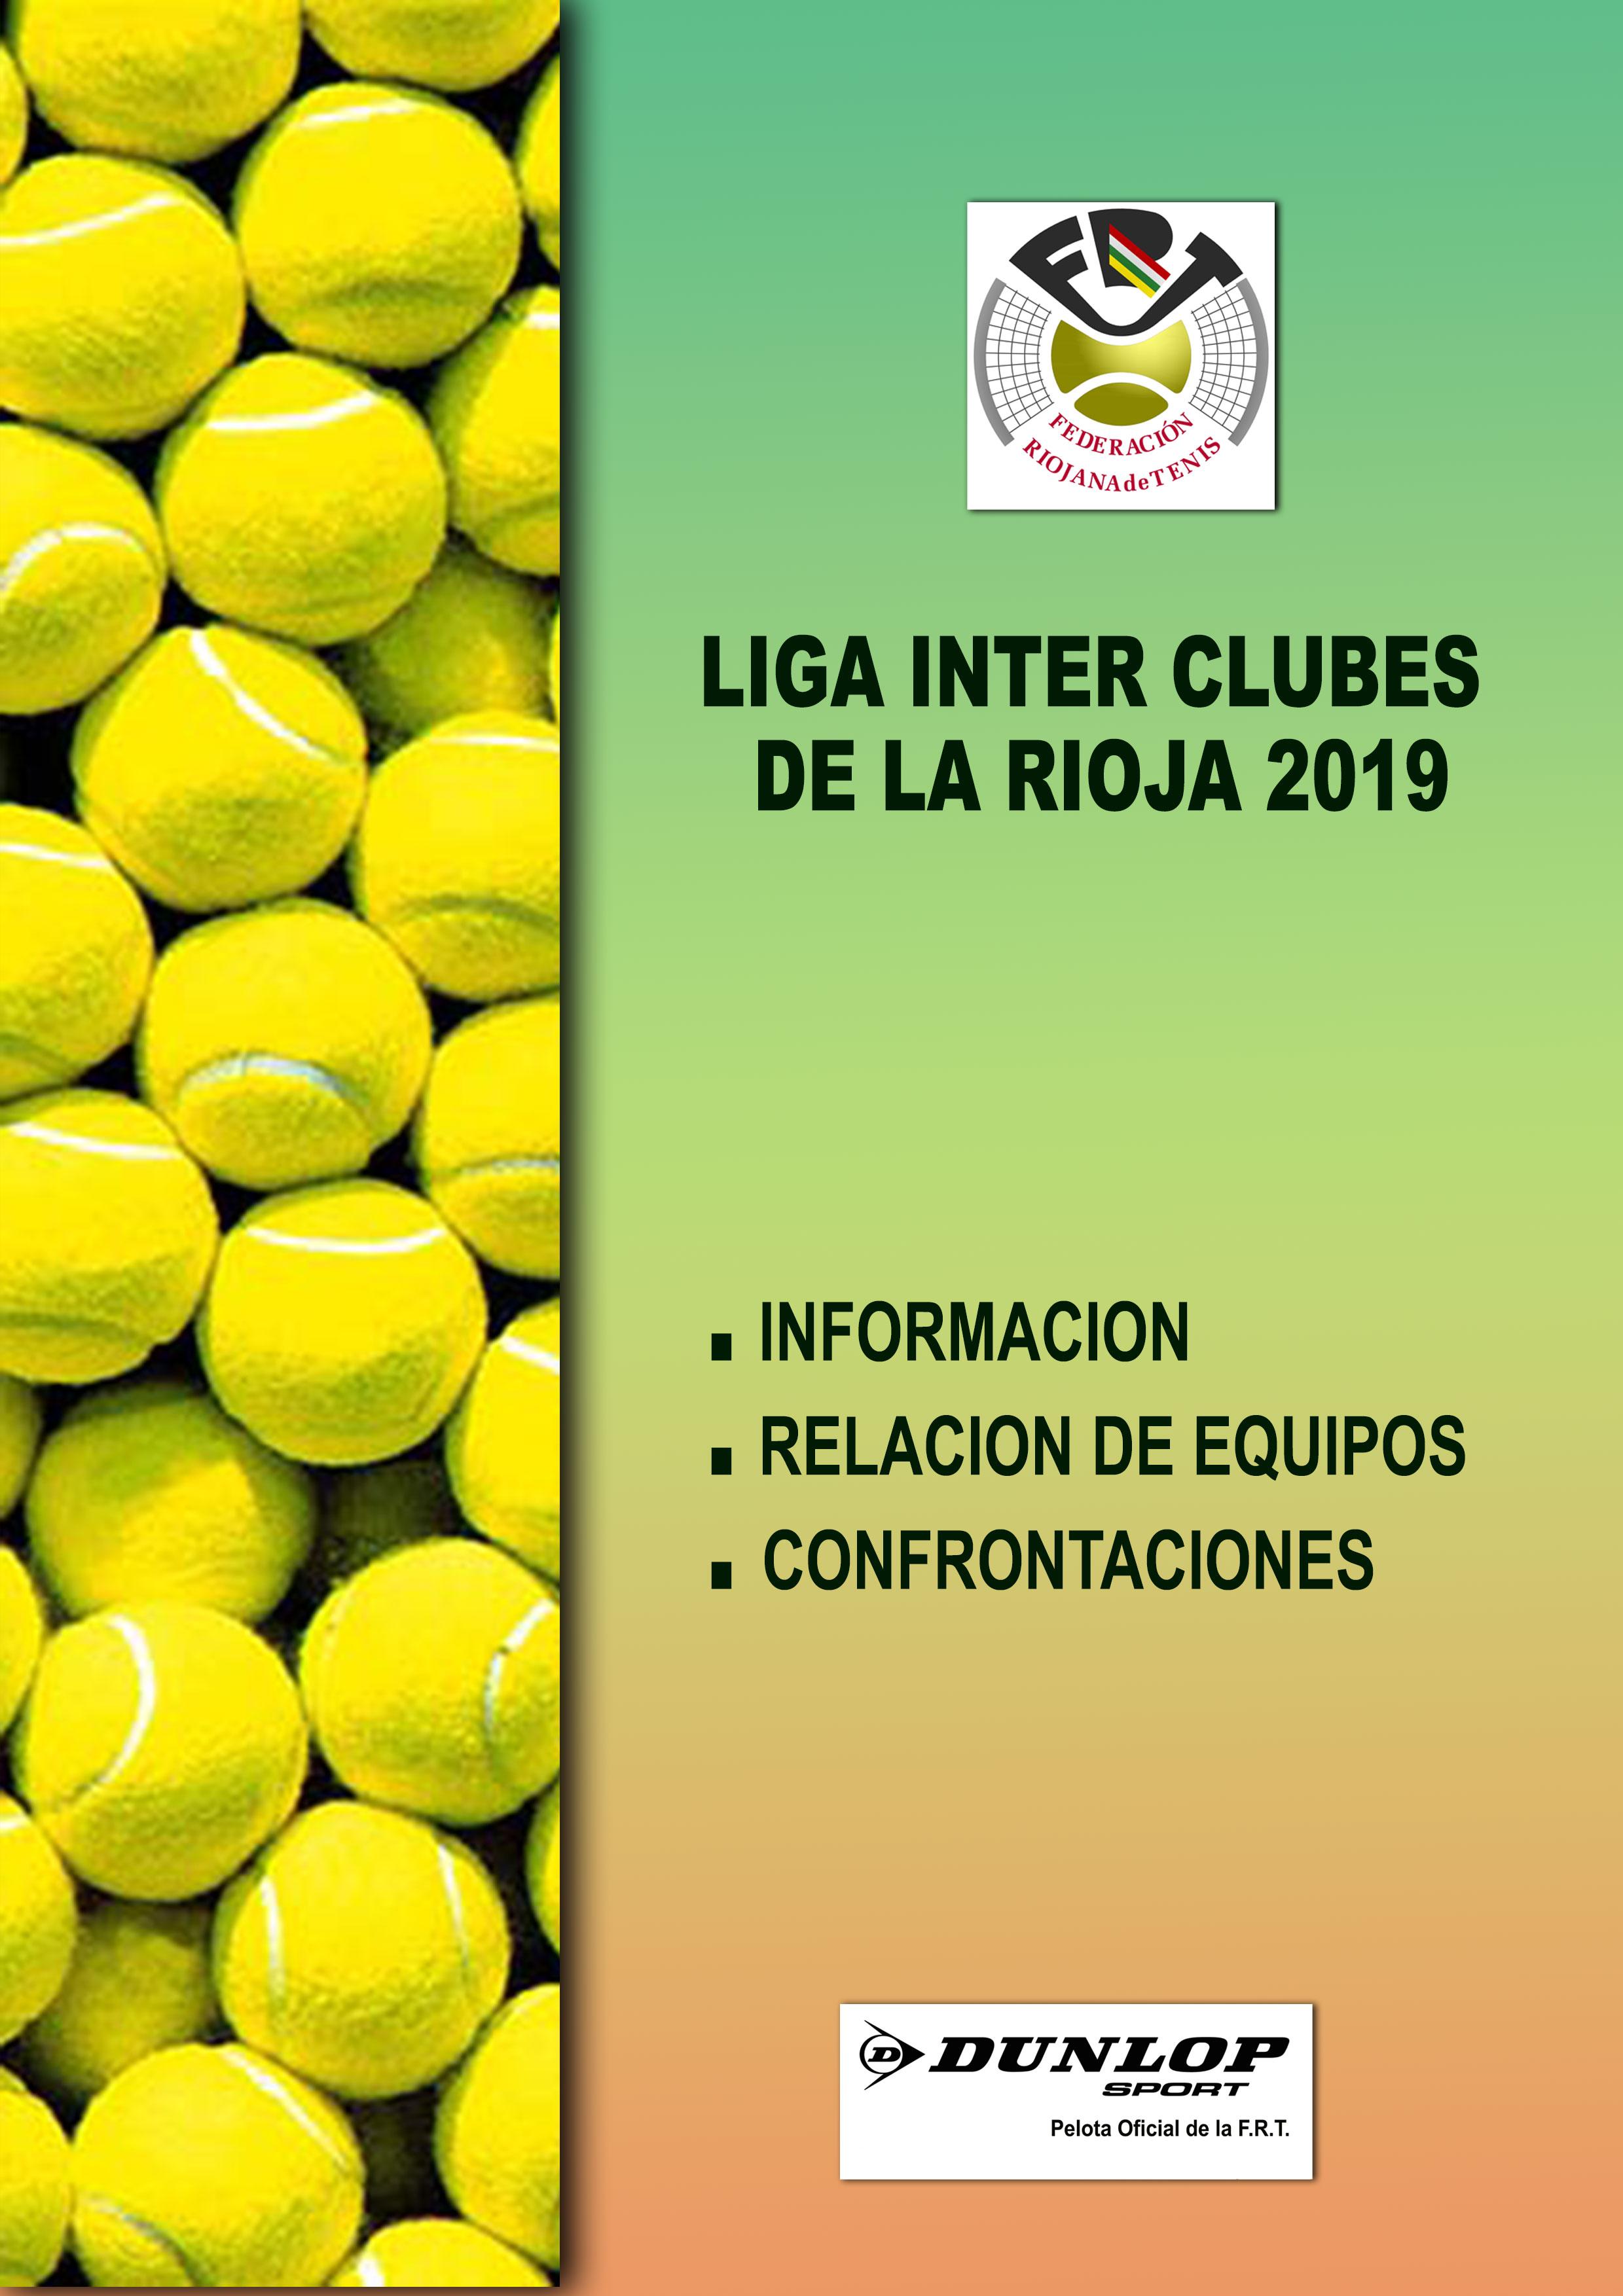 INTER CLUBES DE LA RIOJA 2019